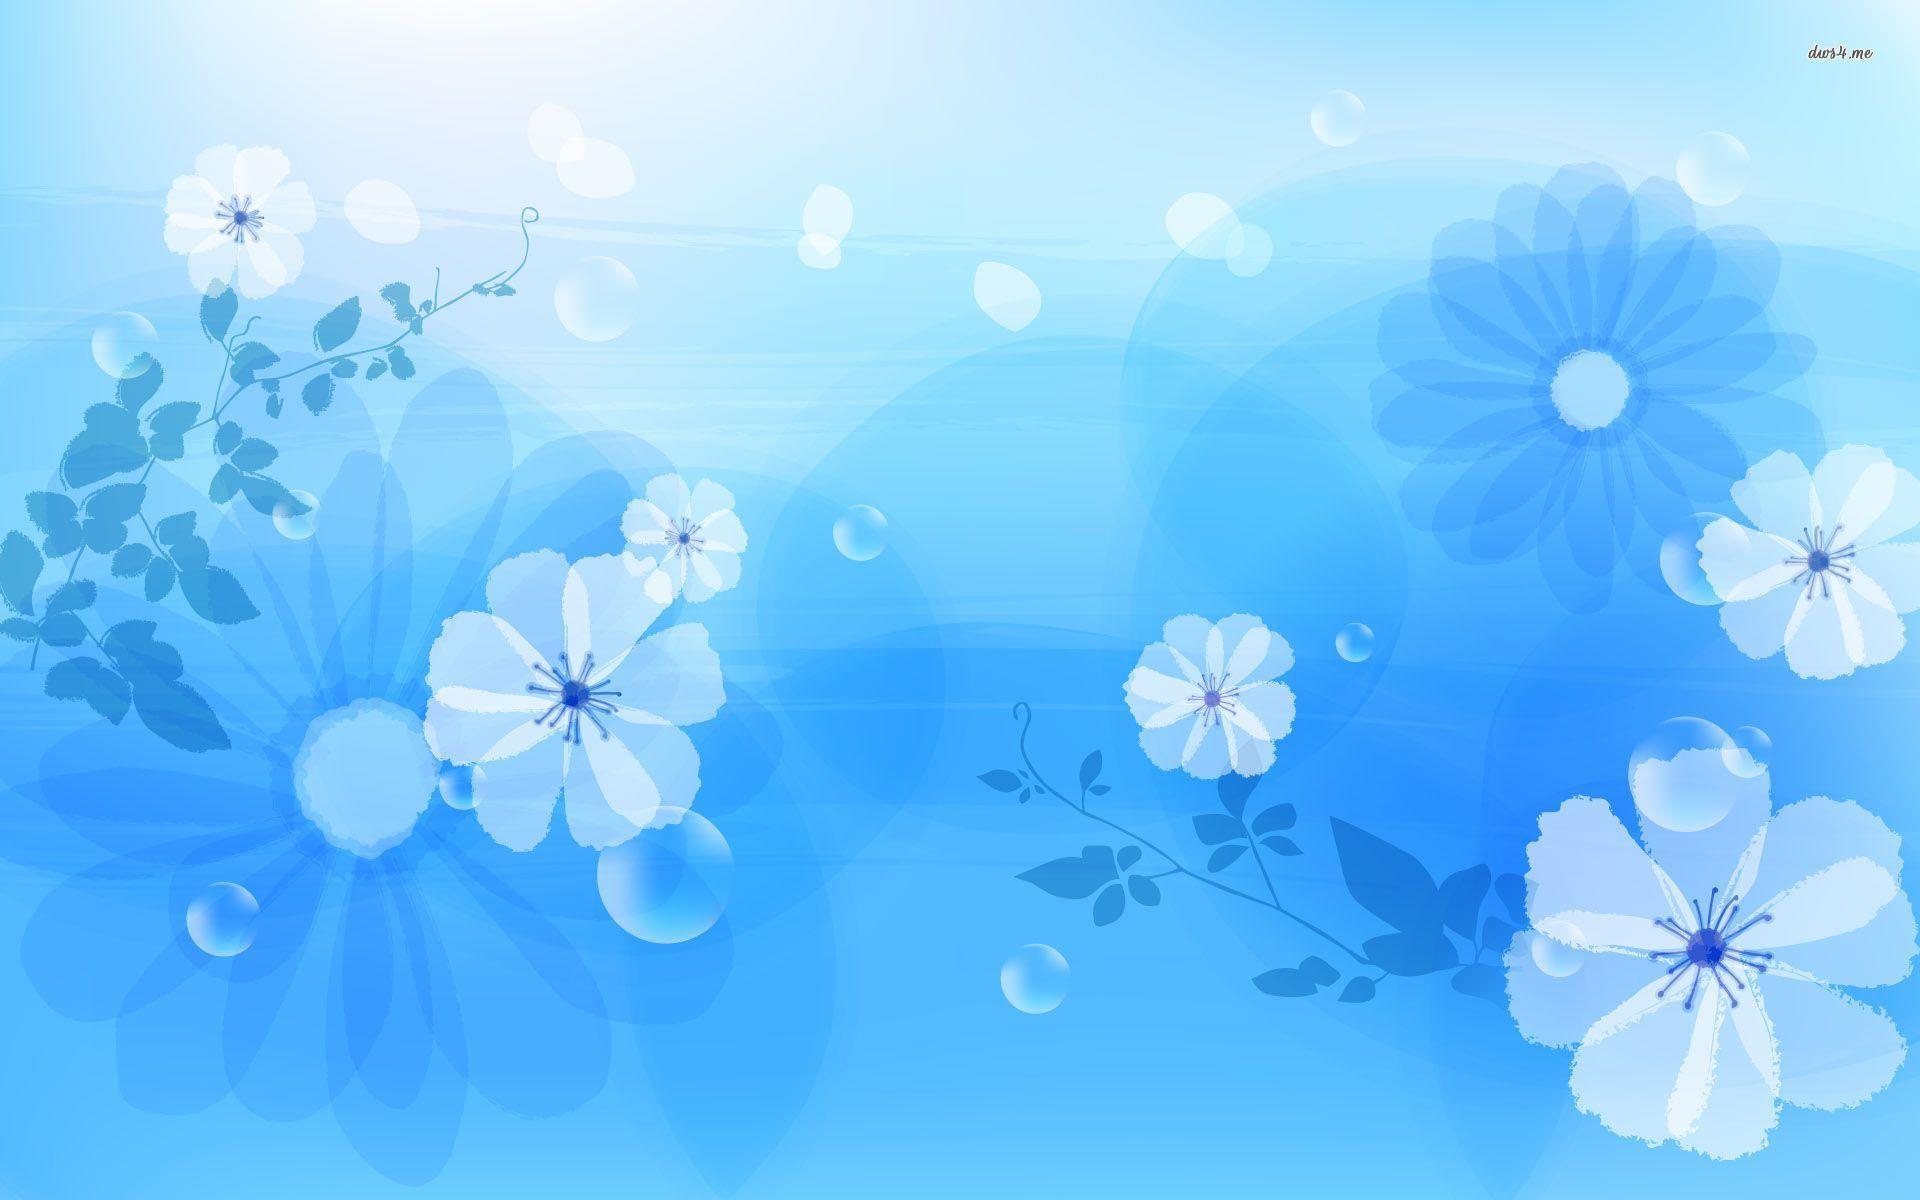 Blue flowers widescreen wallpaper white pictures picturesboss white wallpaper with blue flowers widescreen wallpaper jpg 1920x1200 blue flowers widescreen wallpaper white pictures mightylinksfo